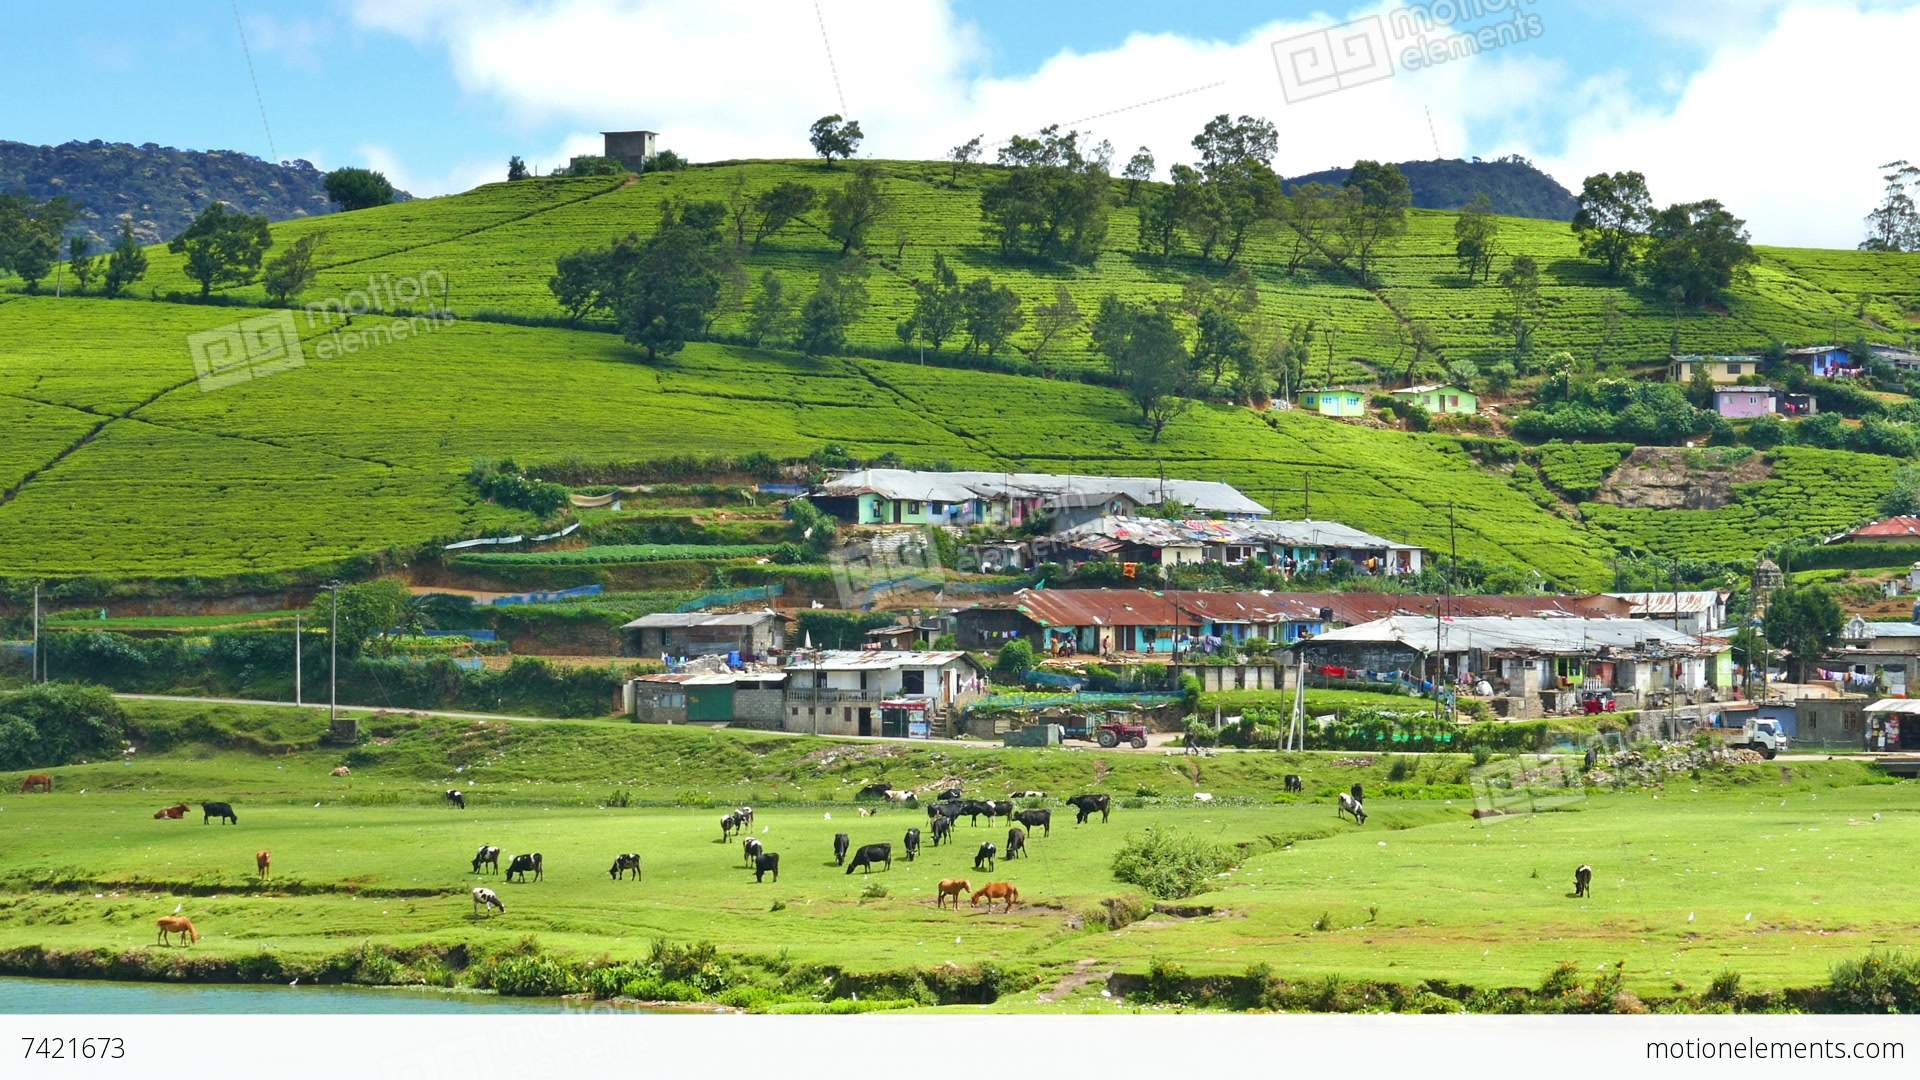 Scenic Beauty of Sri Lanka